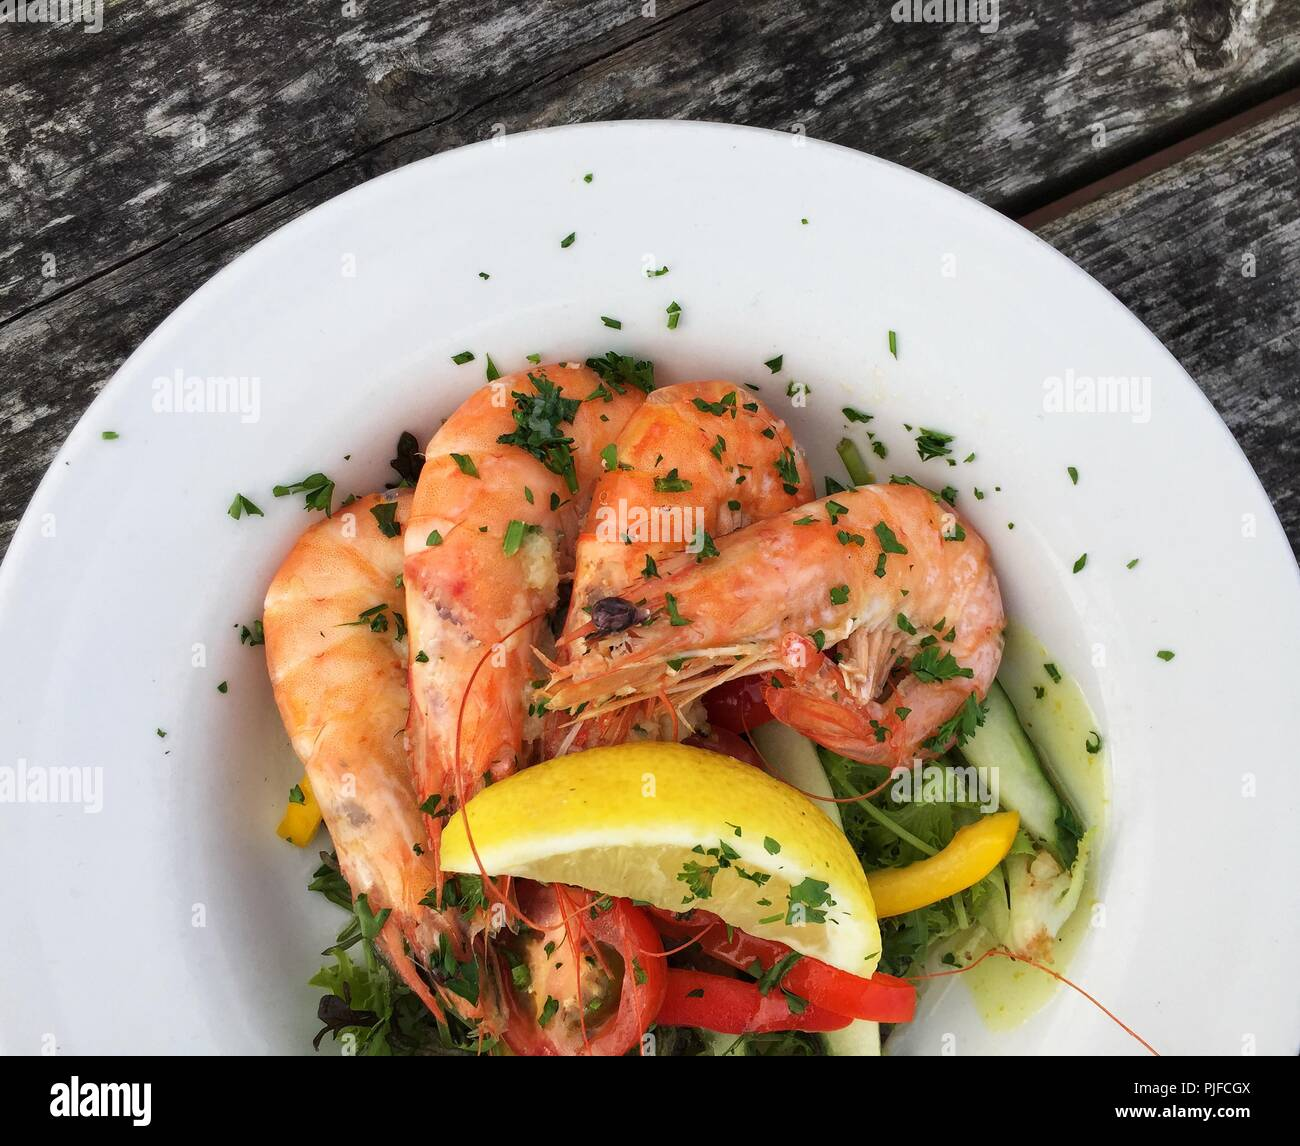 how to keep prawns fresh